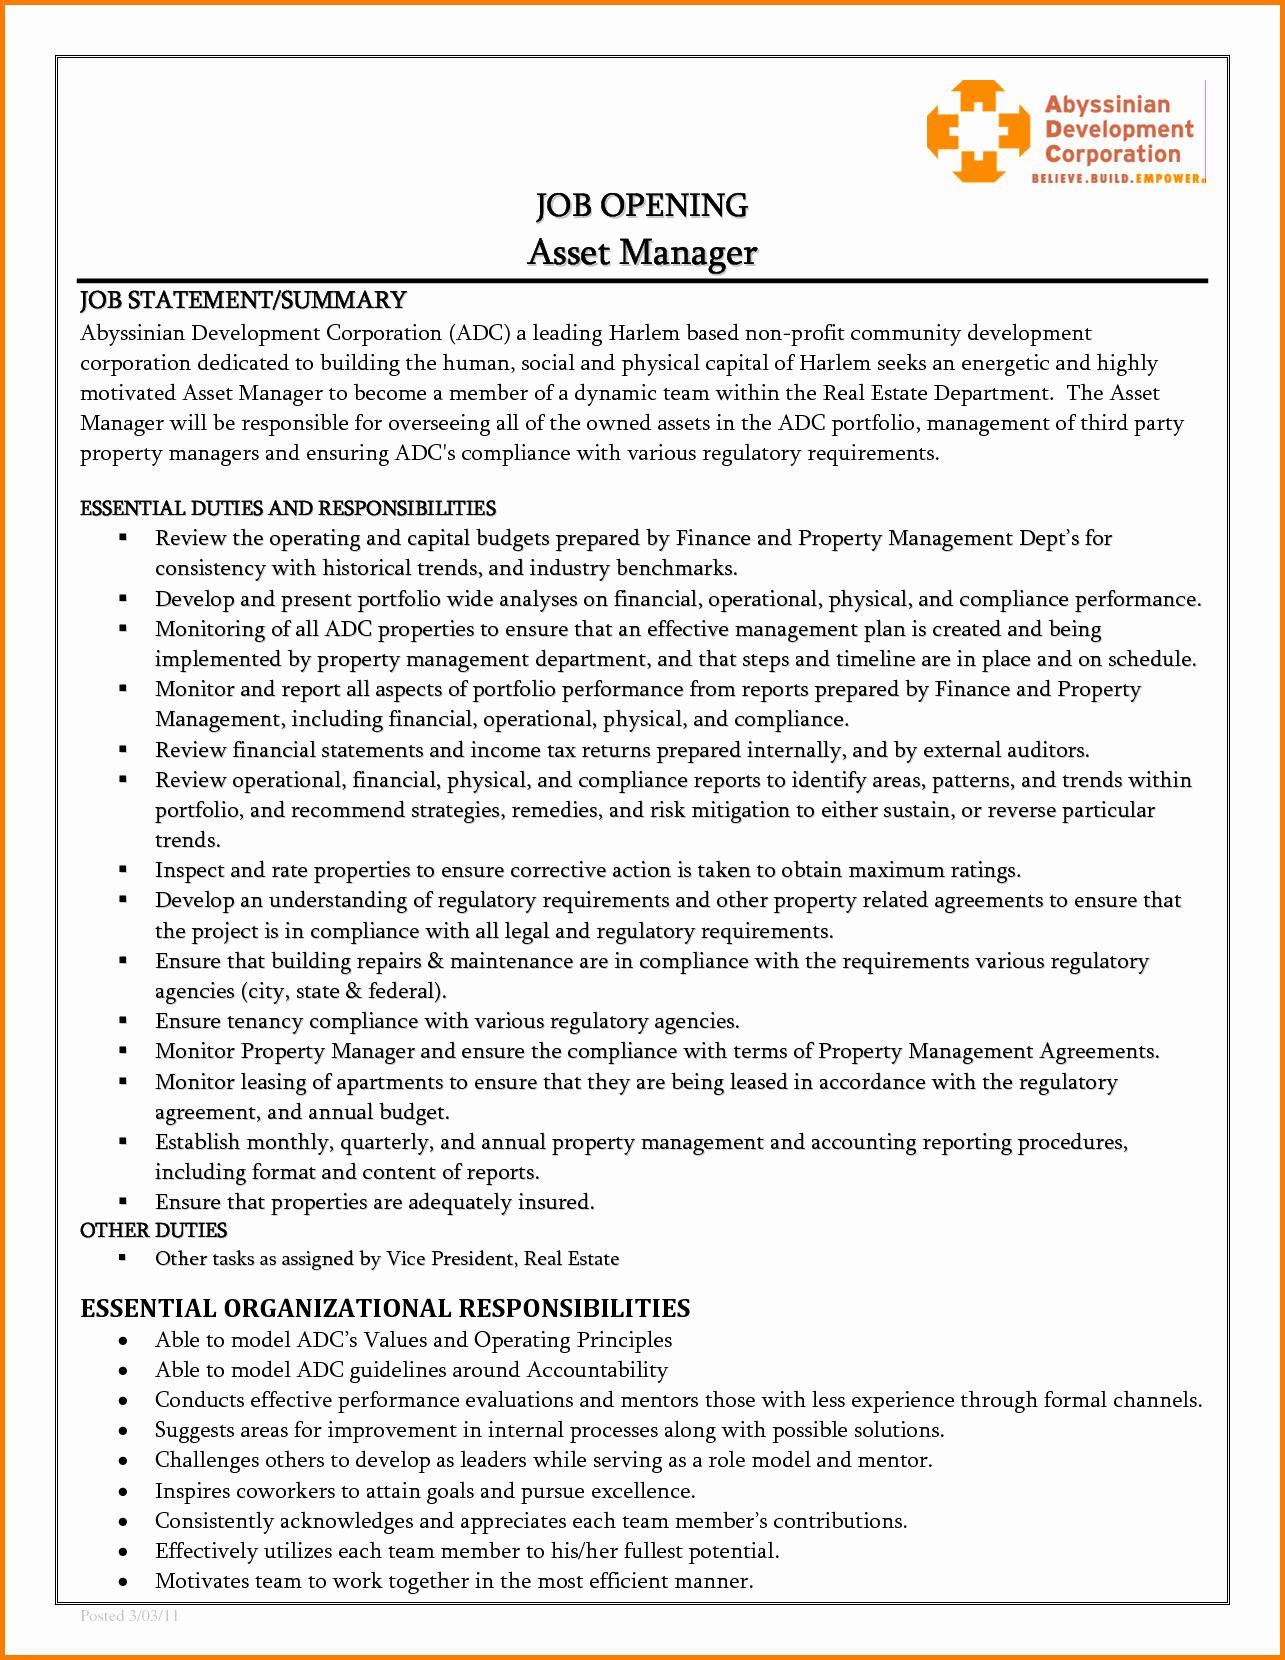 7 Financial Resume Statements